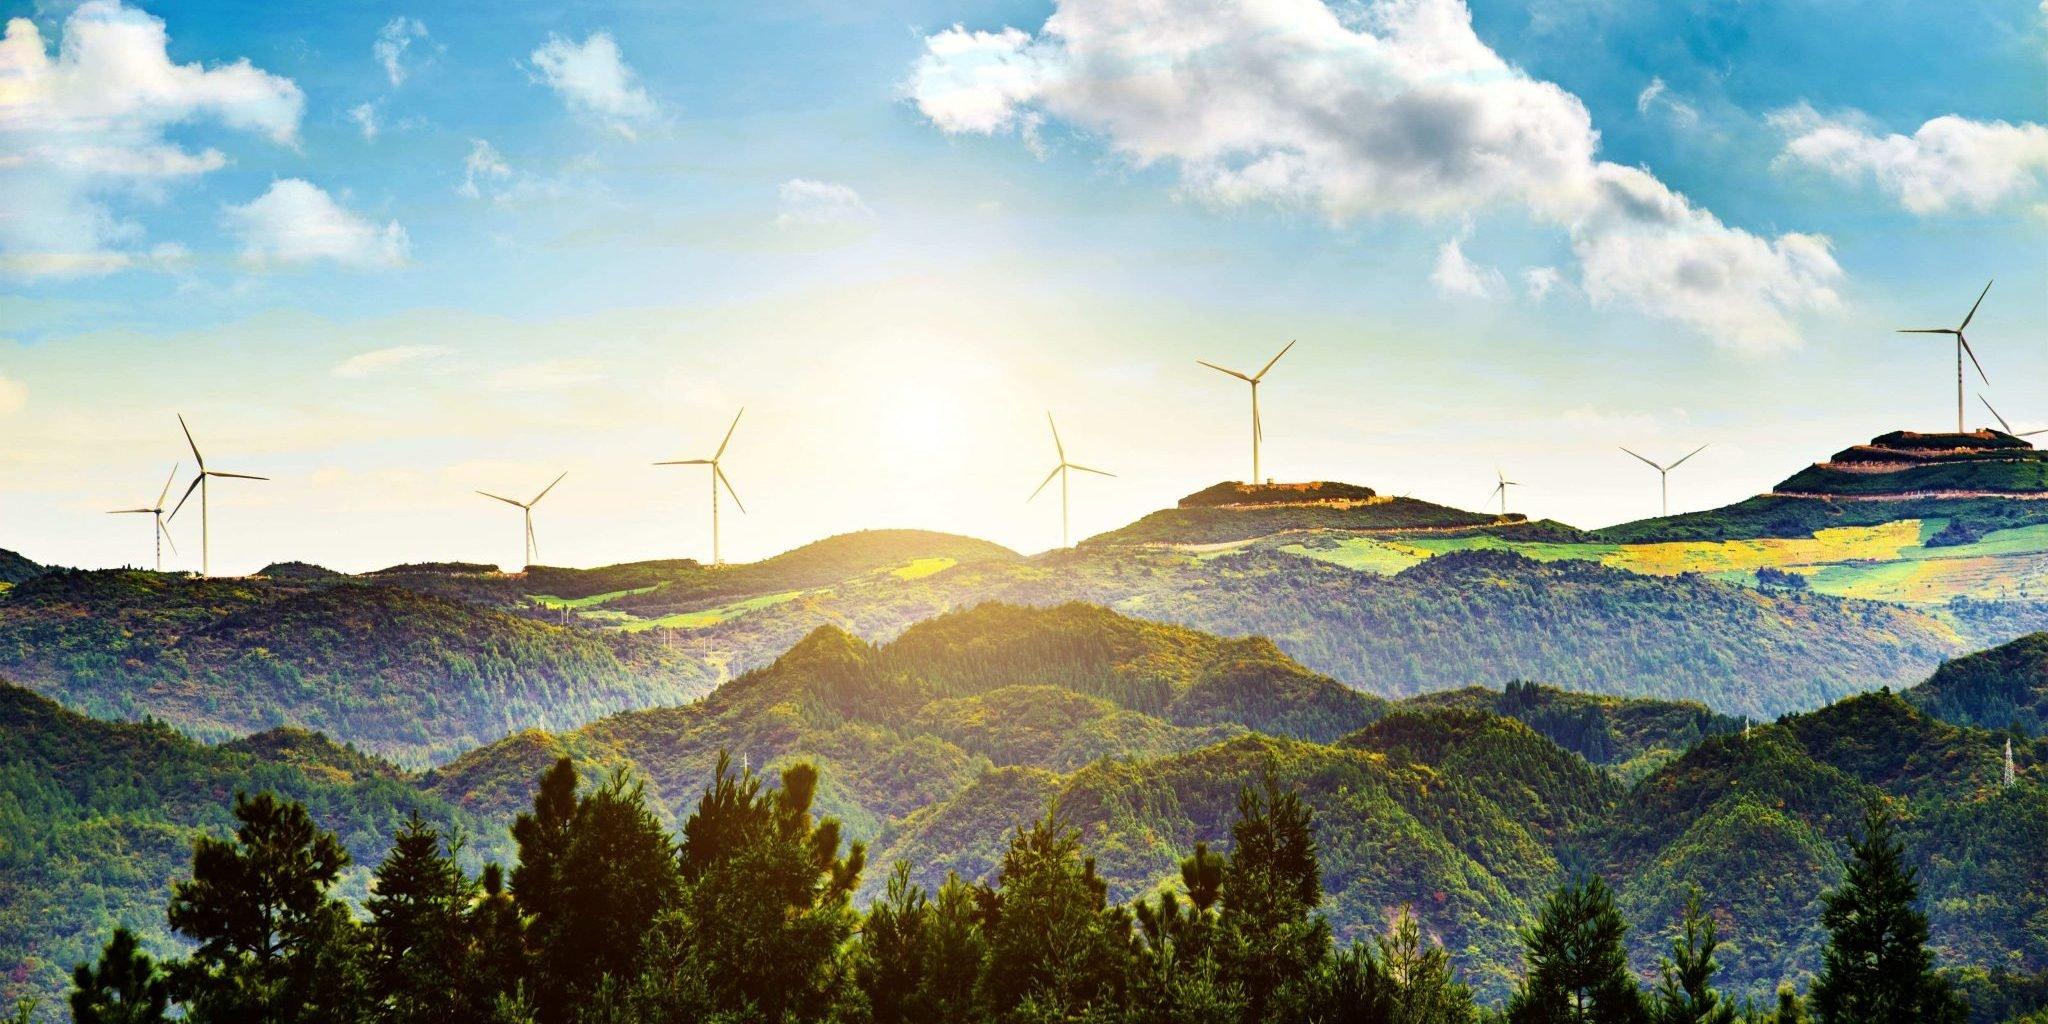 energia eolica 2048x1024 1